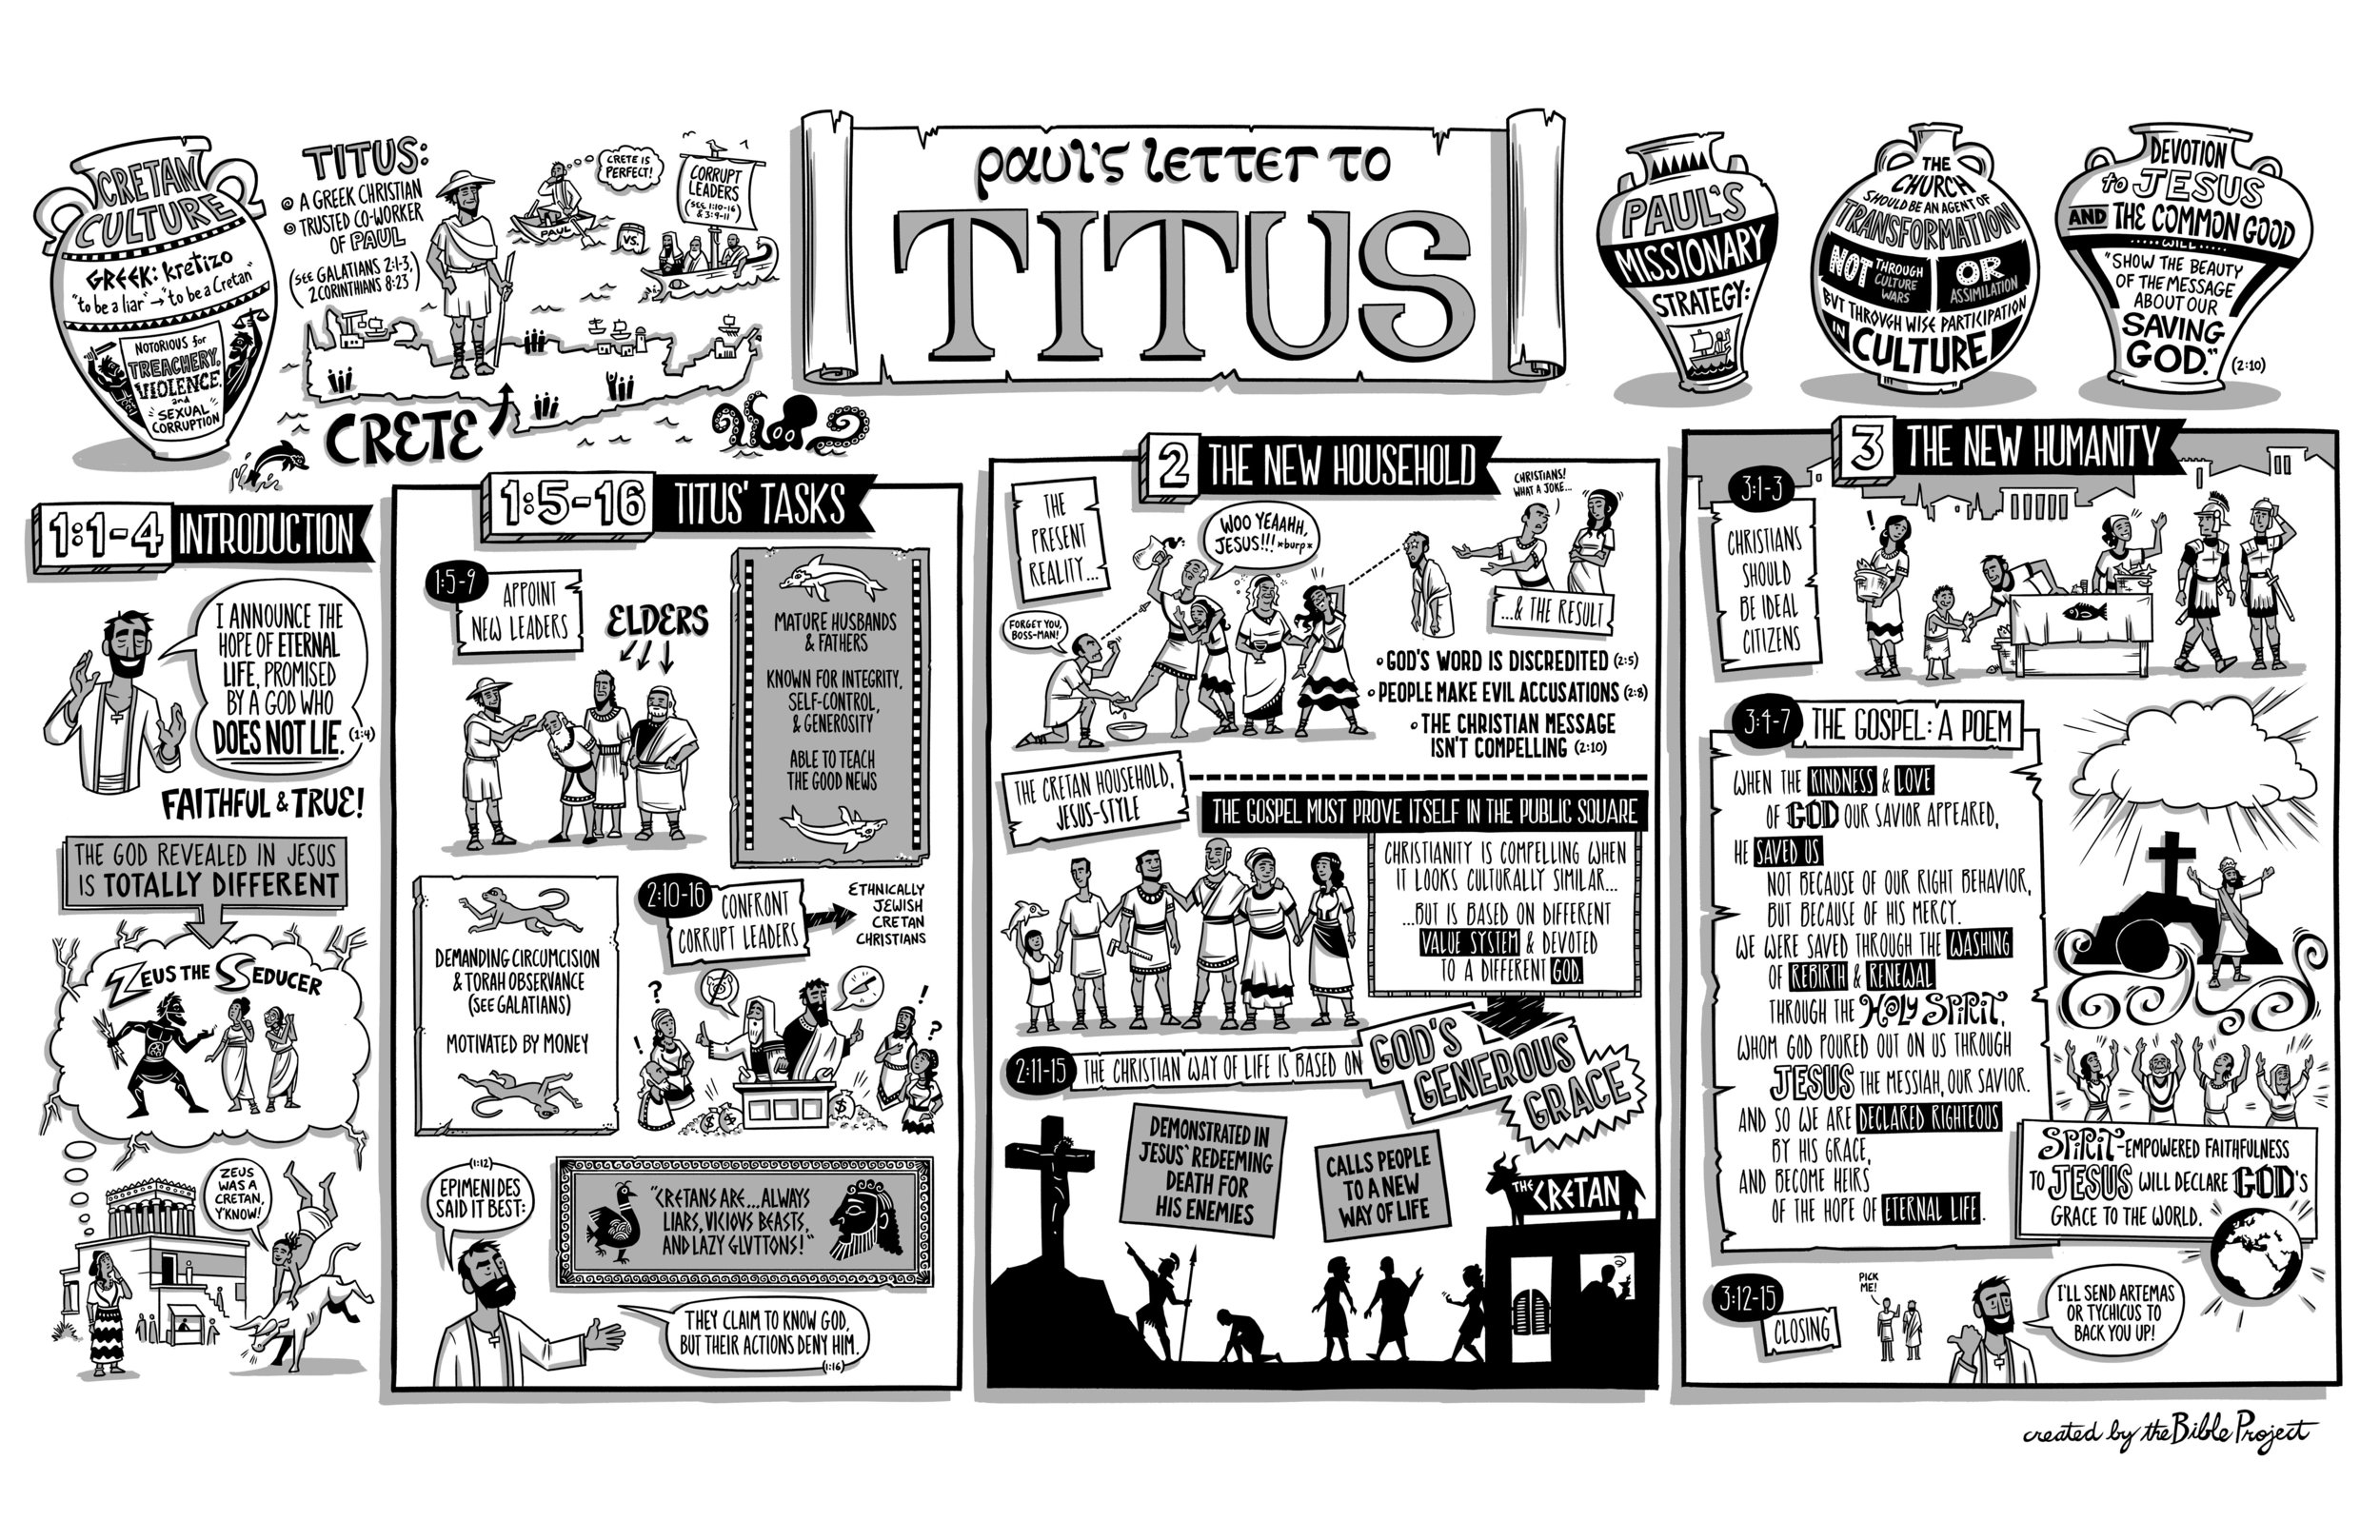 62-Titus-1.jpg